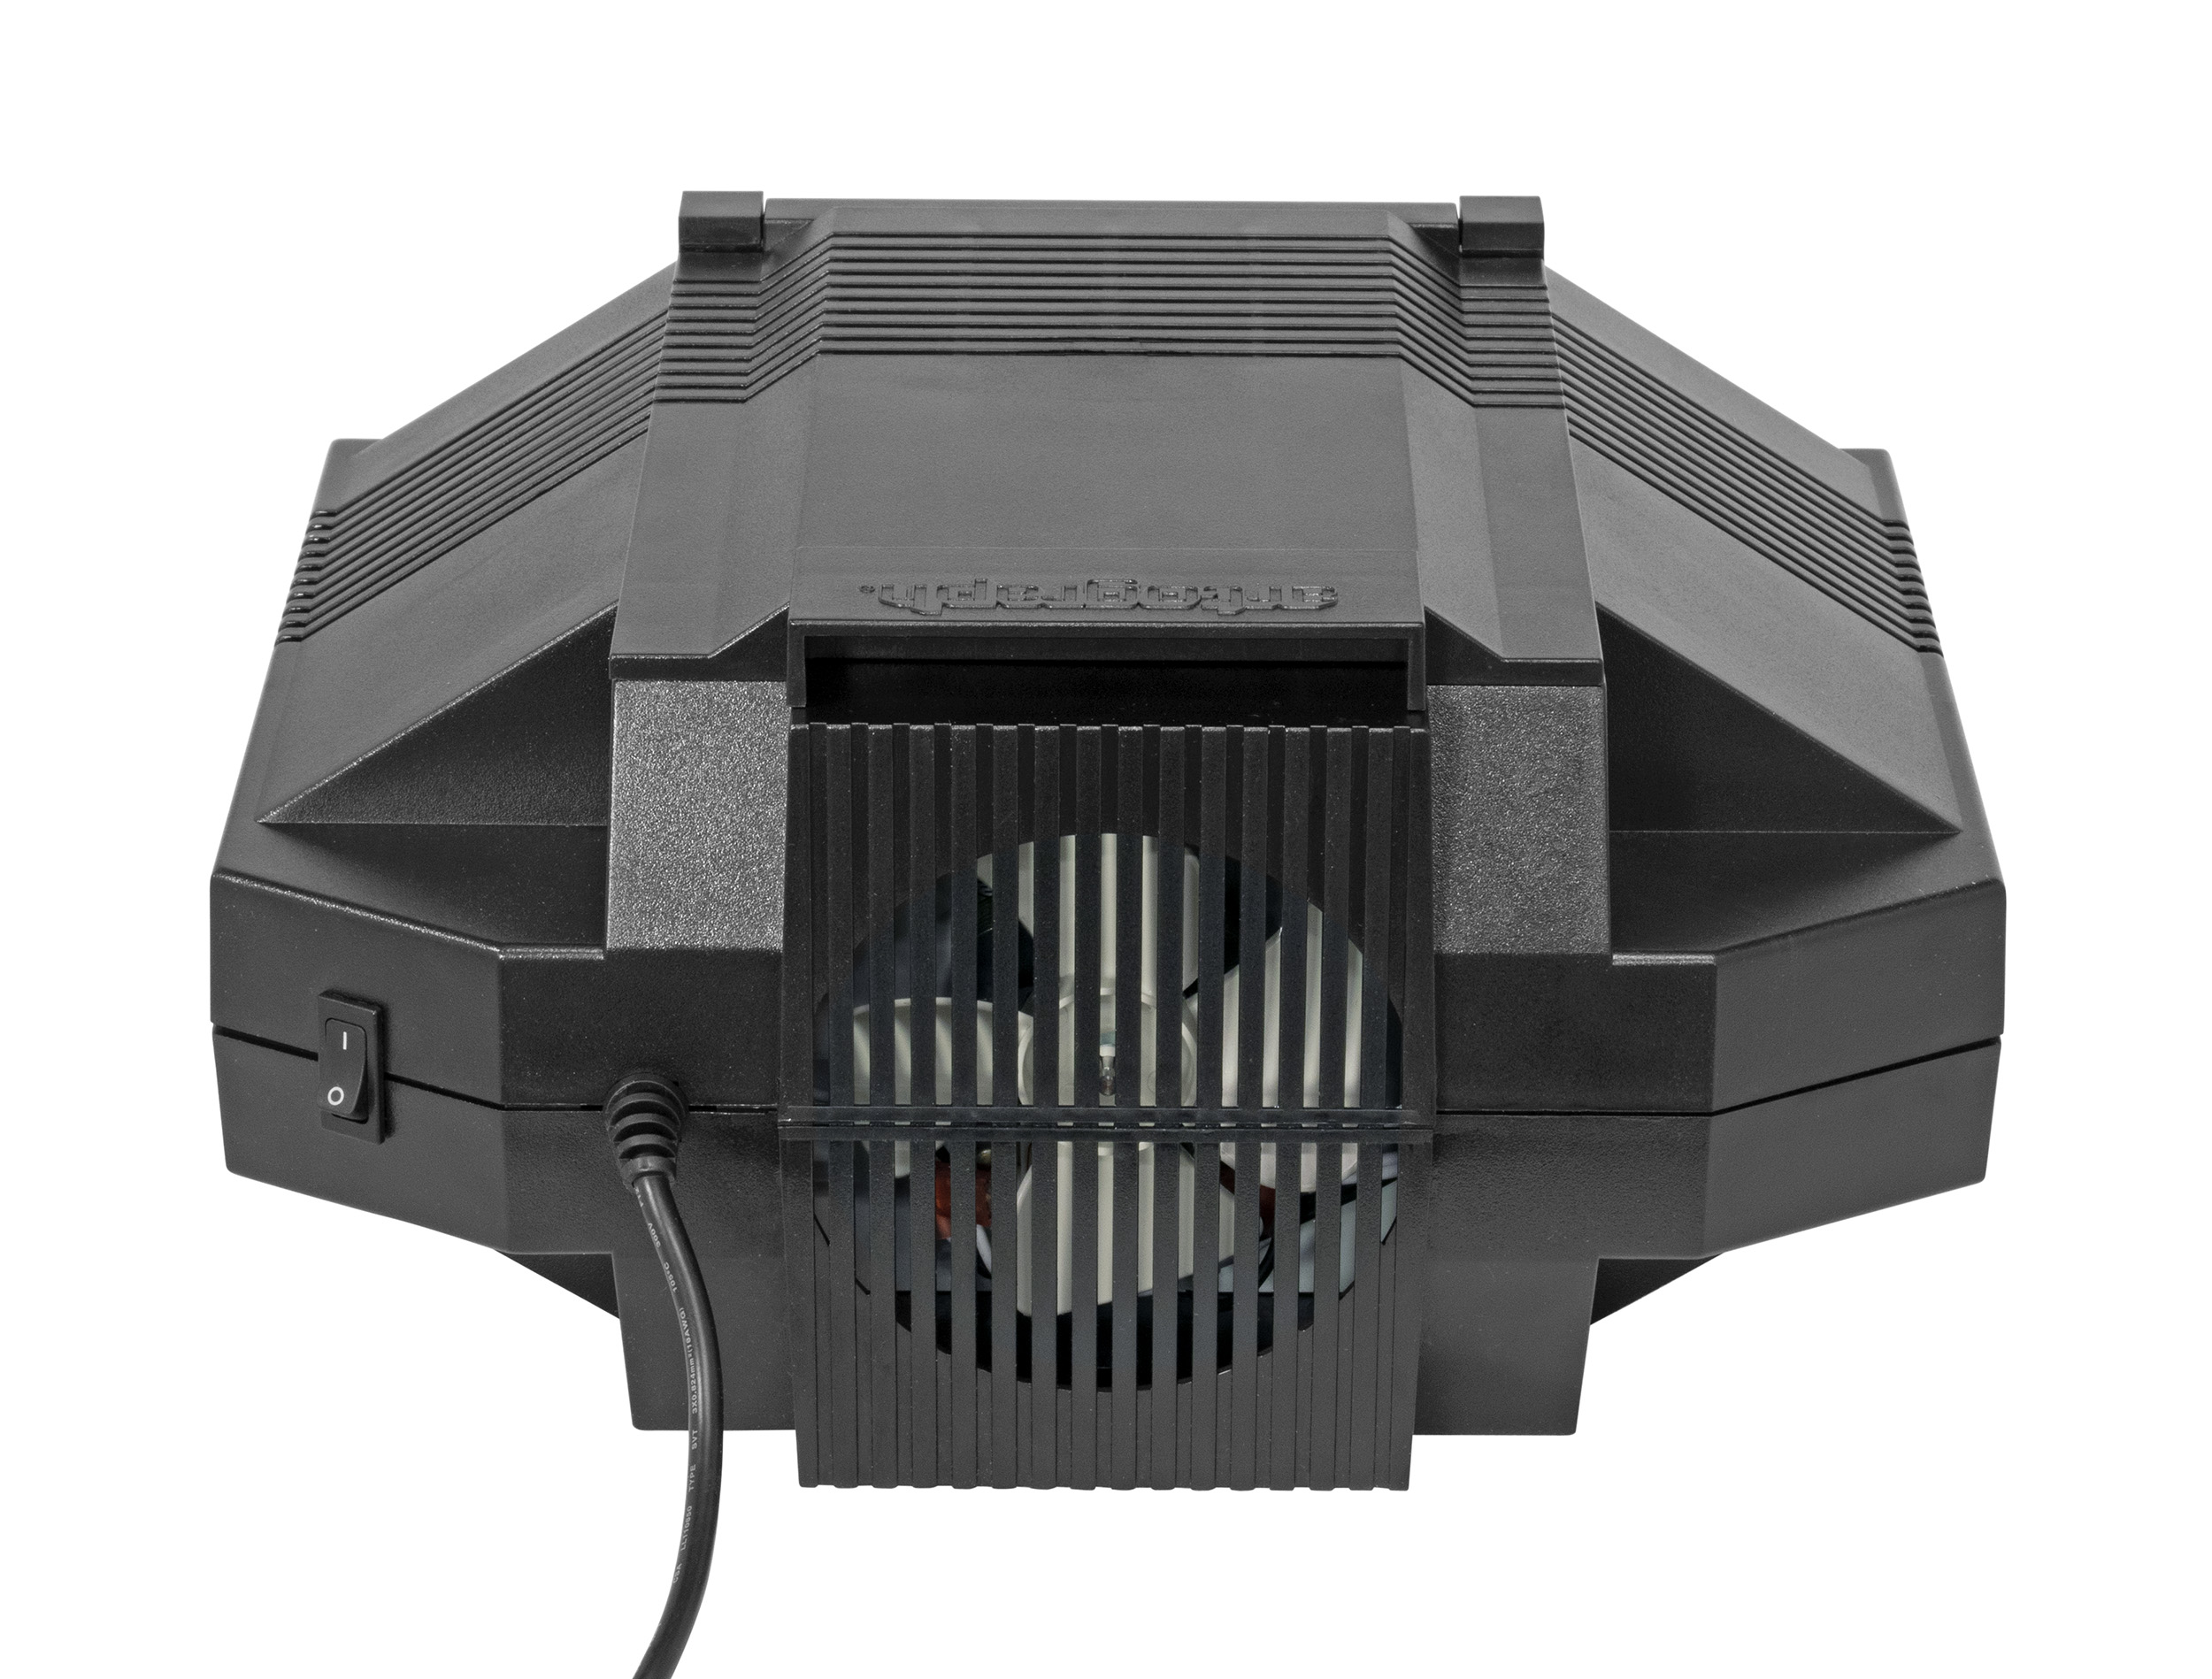 25190-Super-Prism-rear